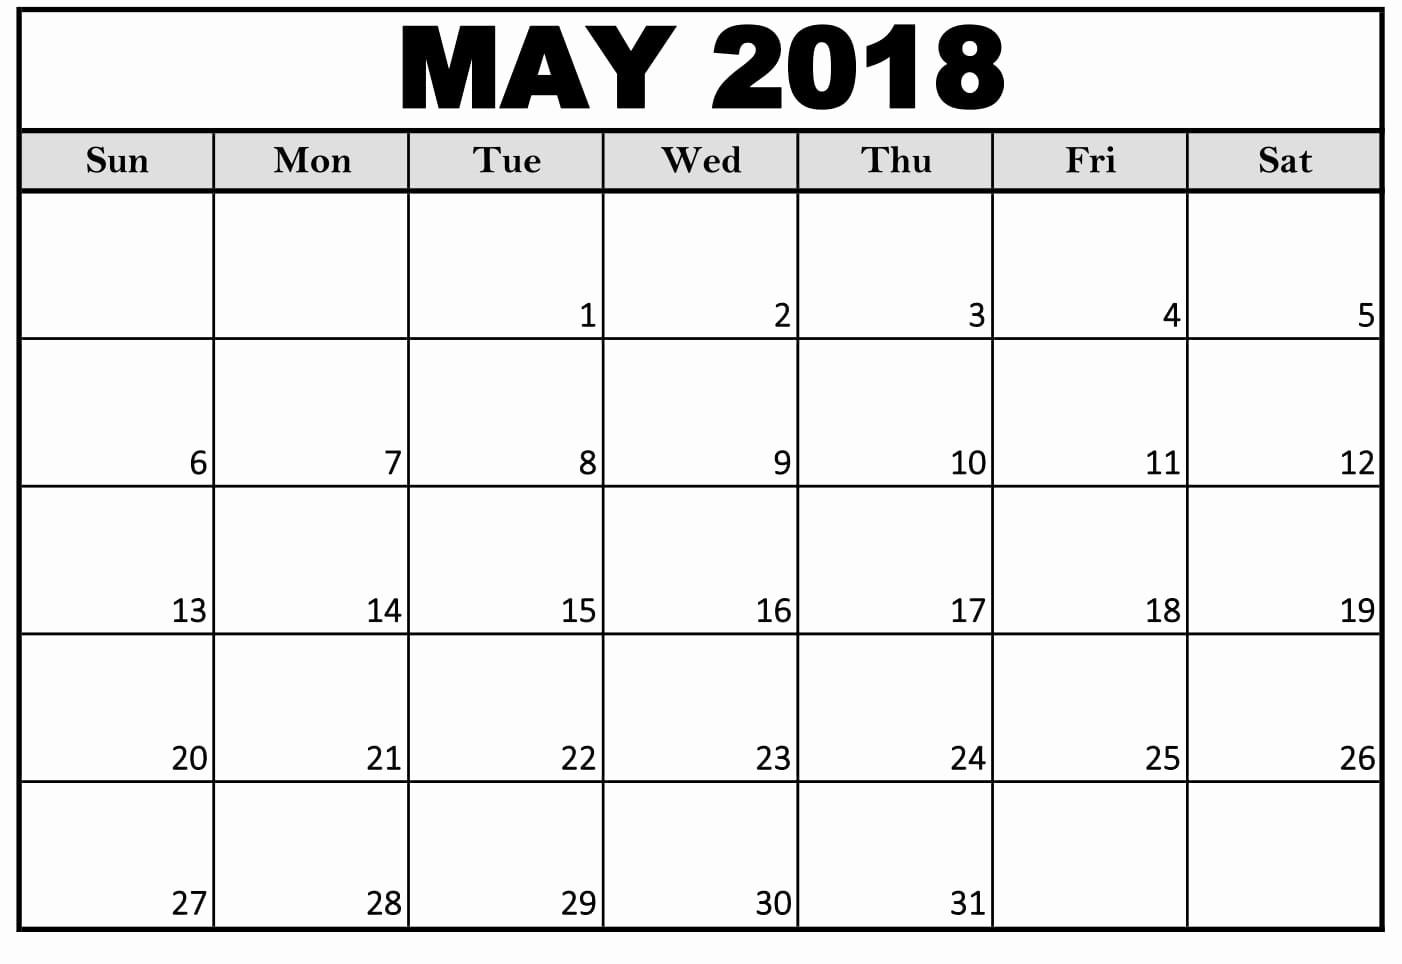 Free May 2018 Calendar Template Inspirational Free 5 May 2018 Calendar Printable Template Pdf source